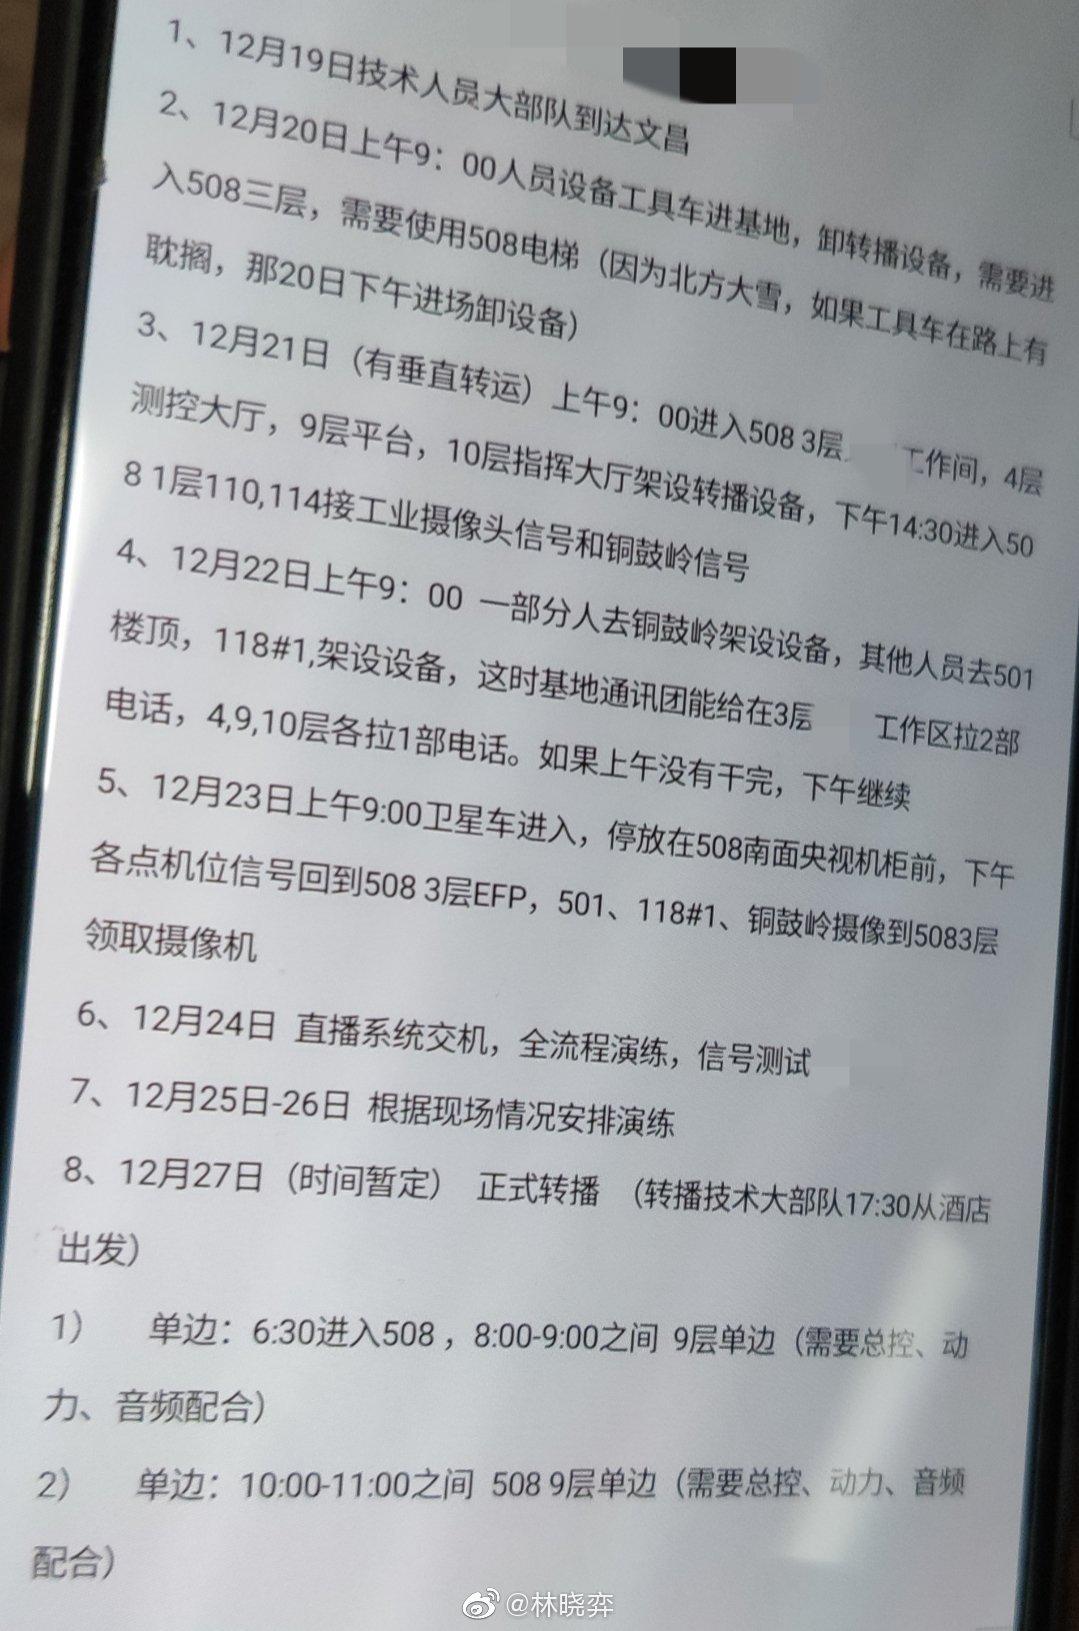 CZ-5 Y3 (Shijian-20) - 27.12.2019 - Page 2 EMQIqASWkAEUAAj?format=jpg&name=large